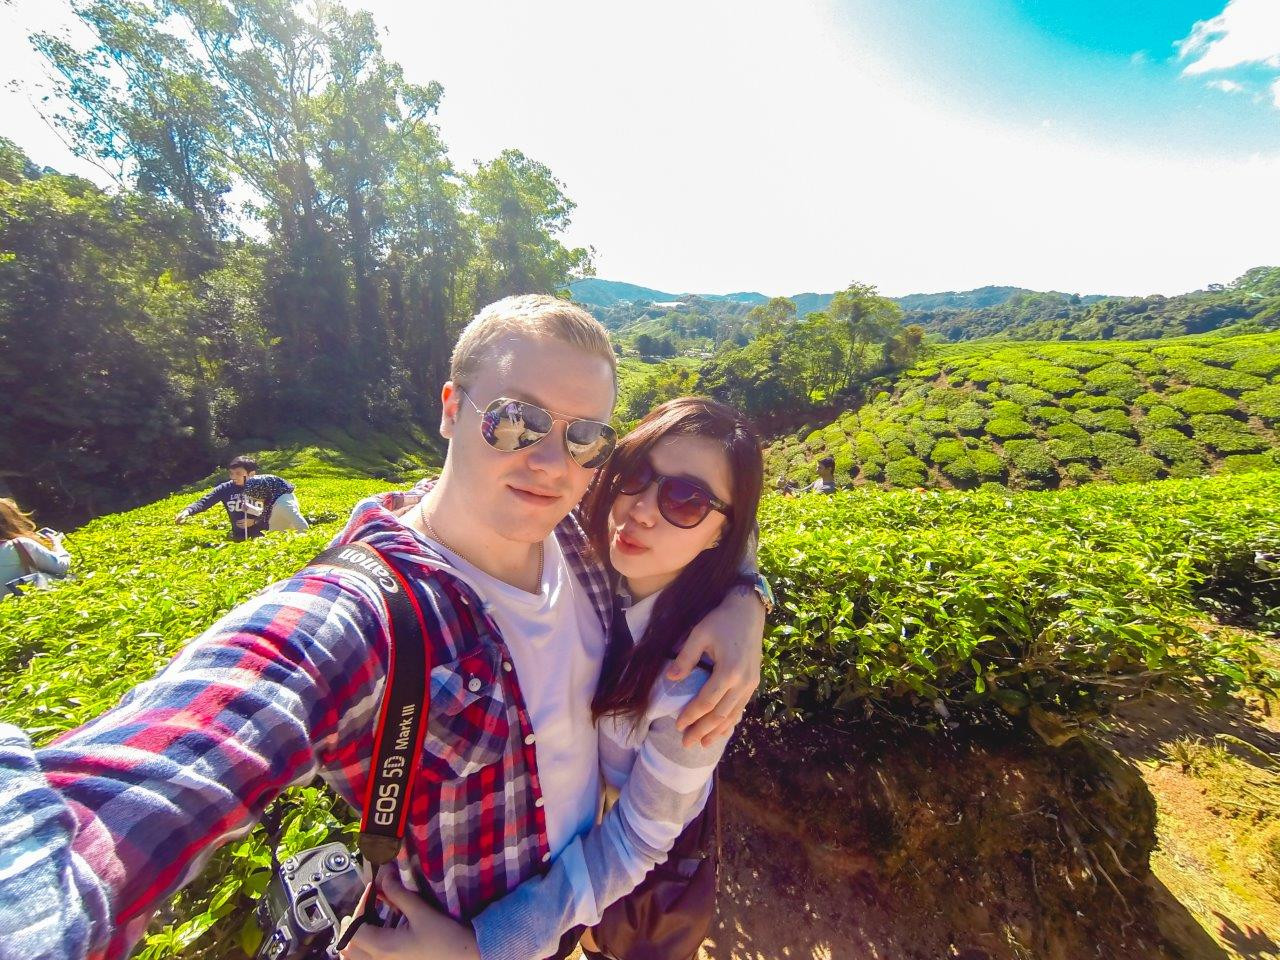 cameron highlands tea plantation places to visit